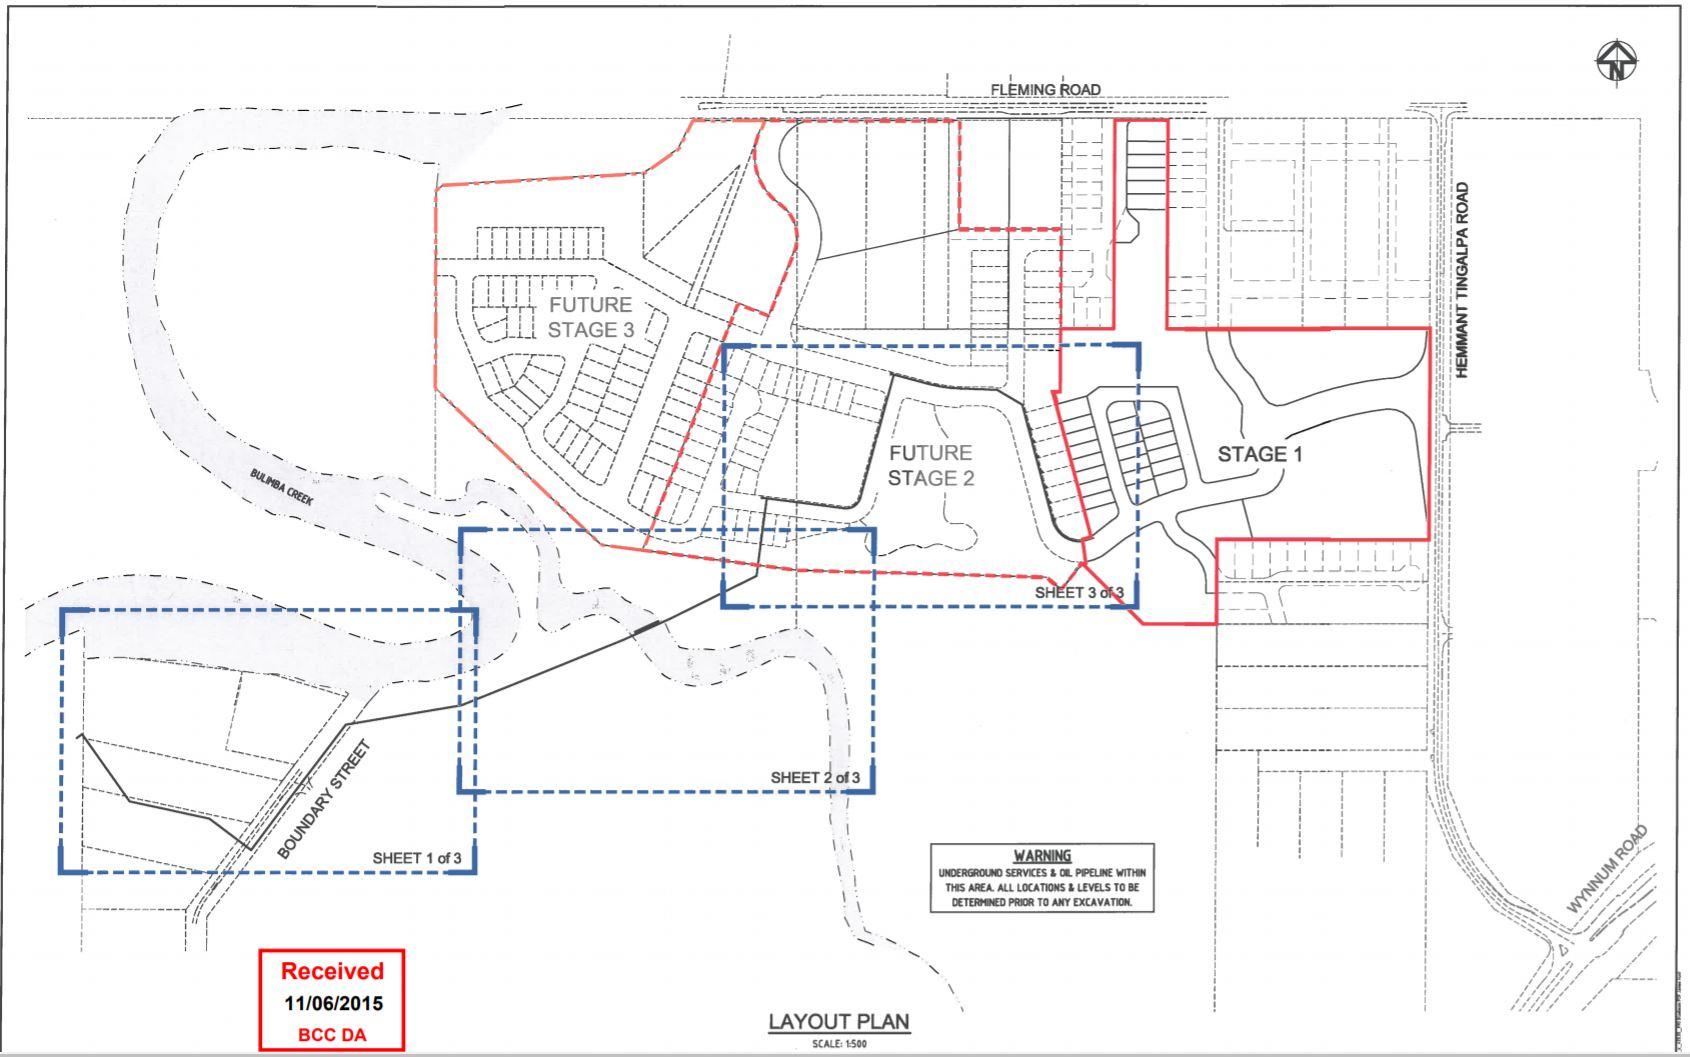 274 FLEMING RD TINGALPA QLD 4173 & 527 HEMMANT-TINGALPA RD TINGALPA QLD 4173 (Bulimba Creek Village)